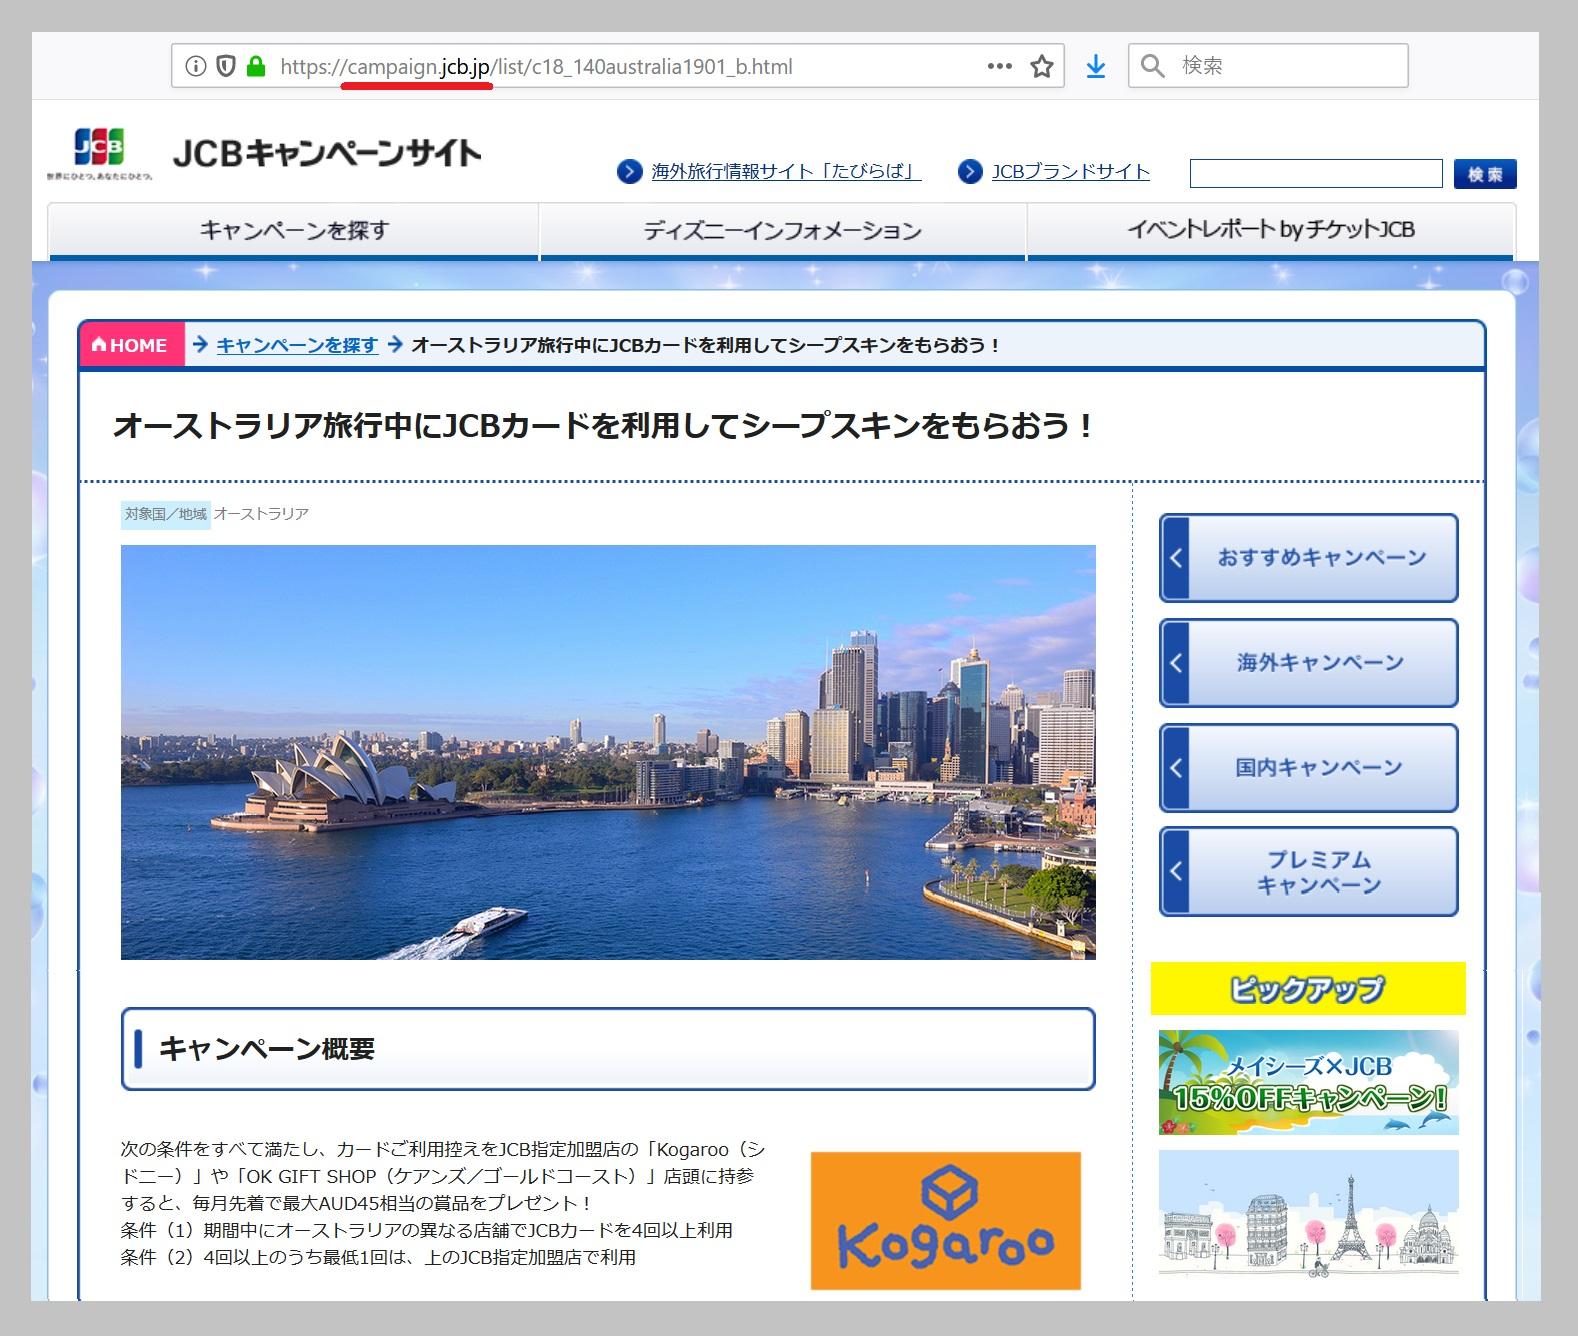 JCBカードの主催するオーストラリア旅行キャンペーン